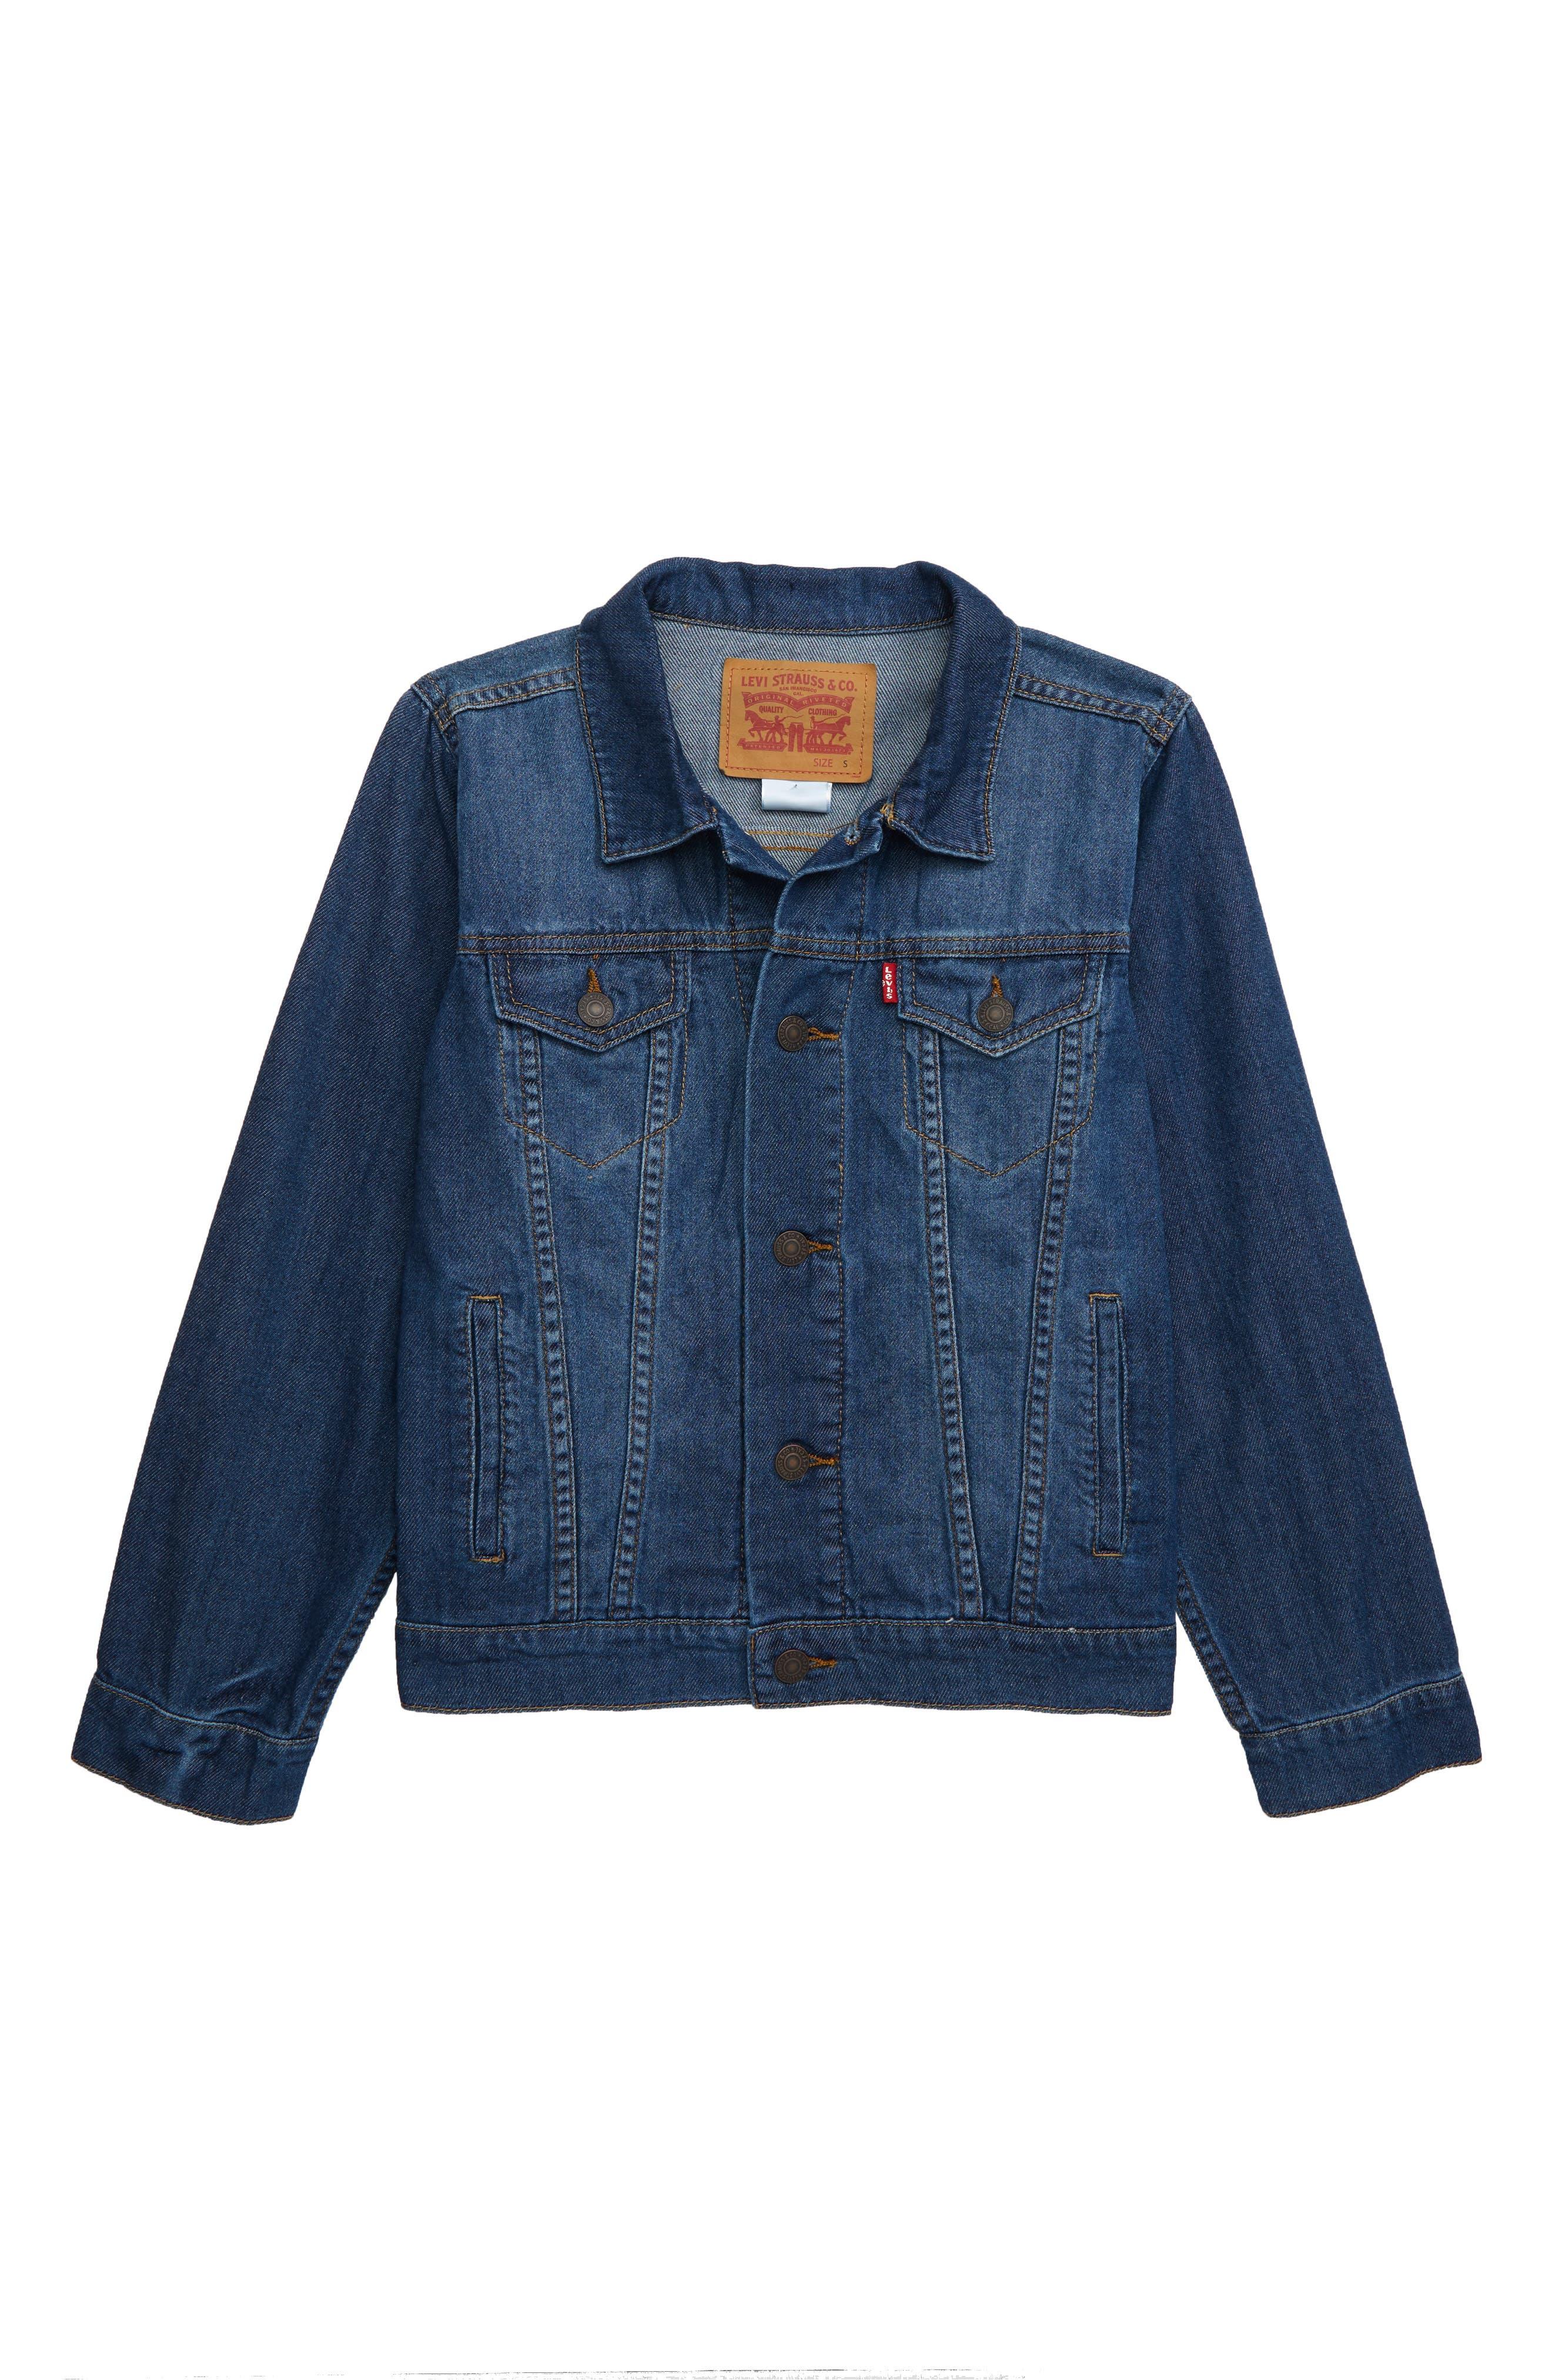 Boys LeviS Lightweight Denim Jacket Size 6  Blue